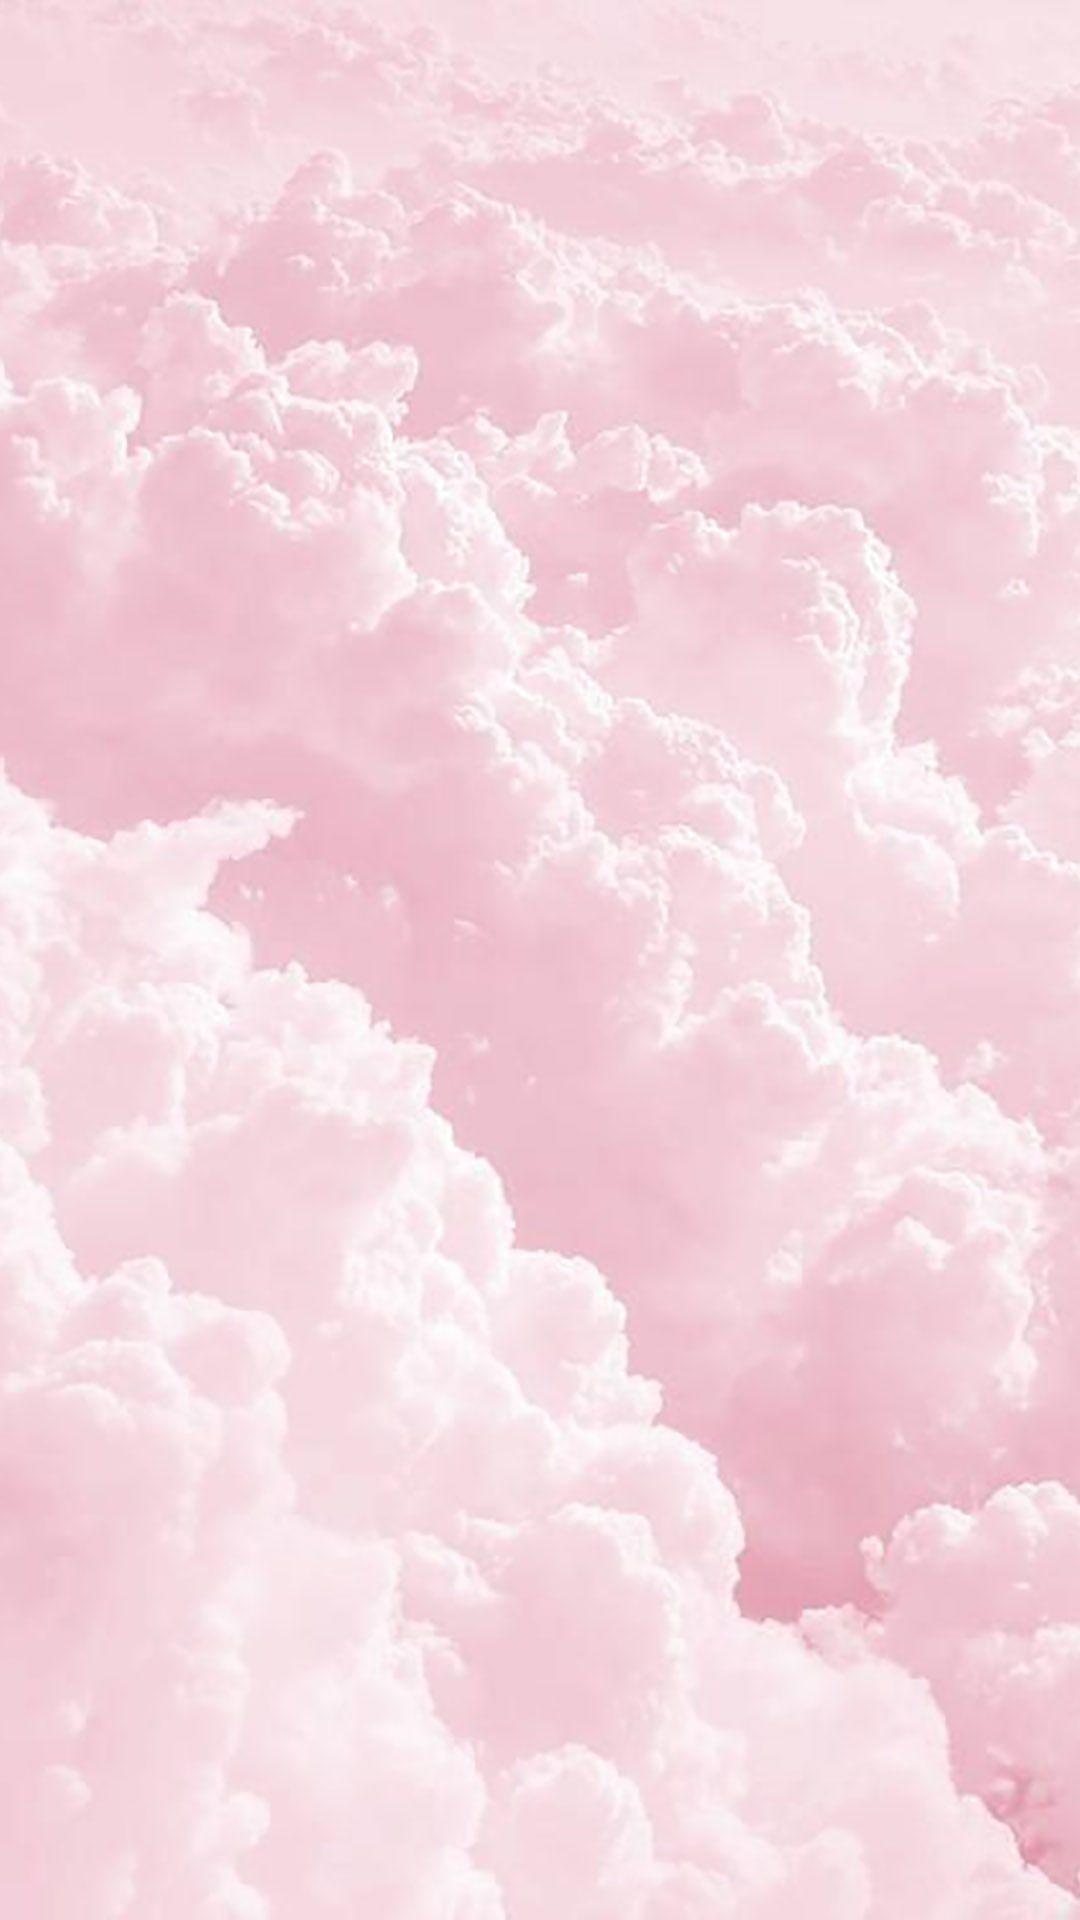 Pinky Wallpaper